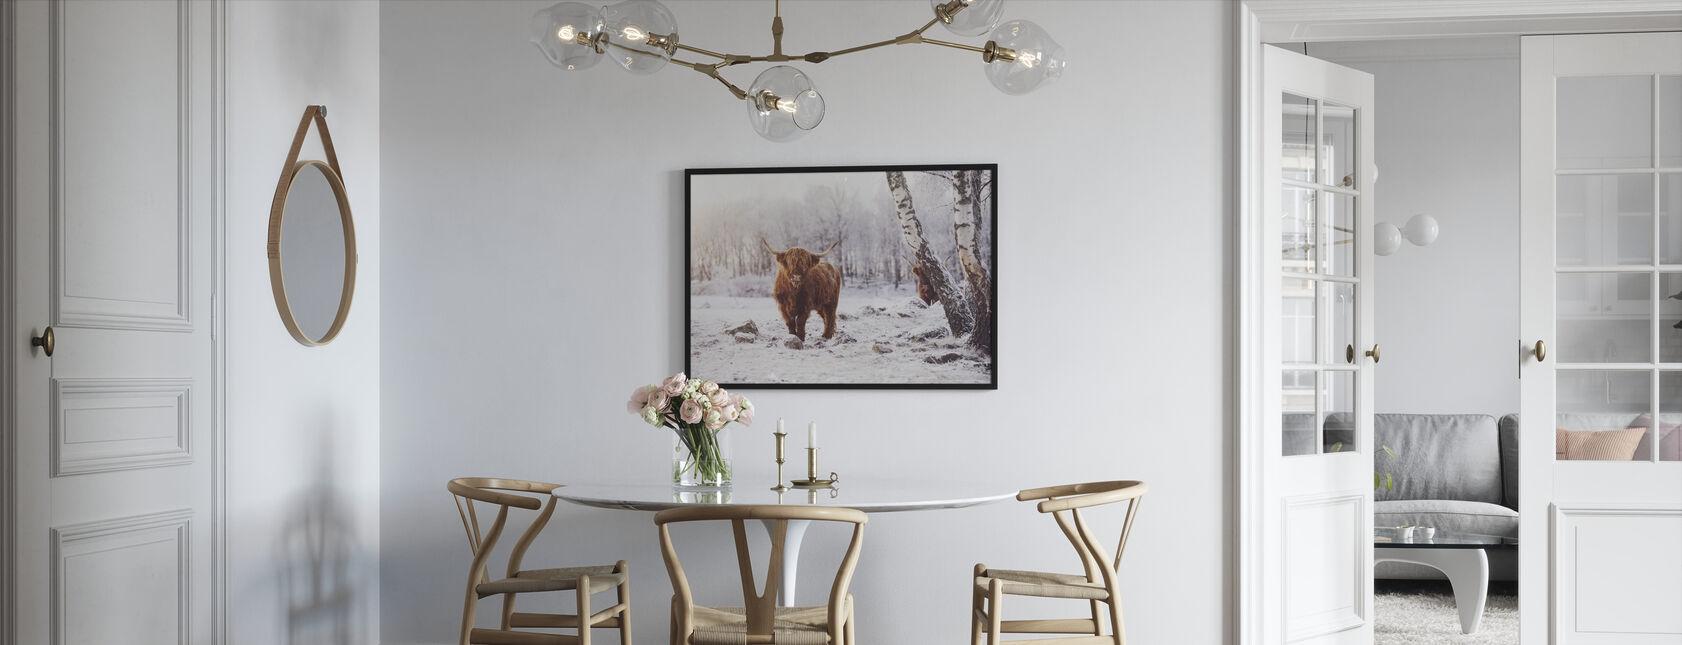 Highland Cattle - Framed print - Kitchen